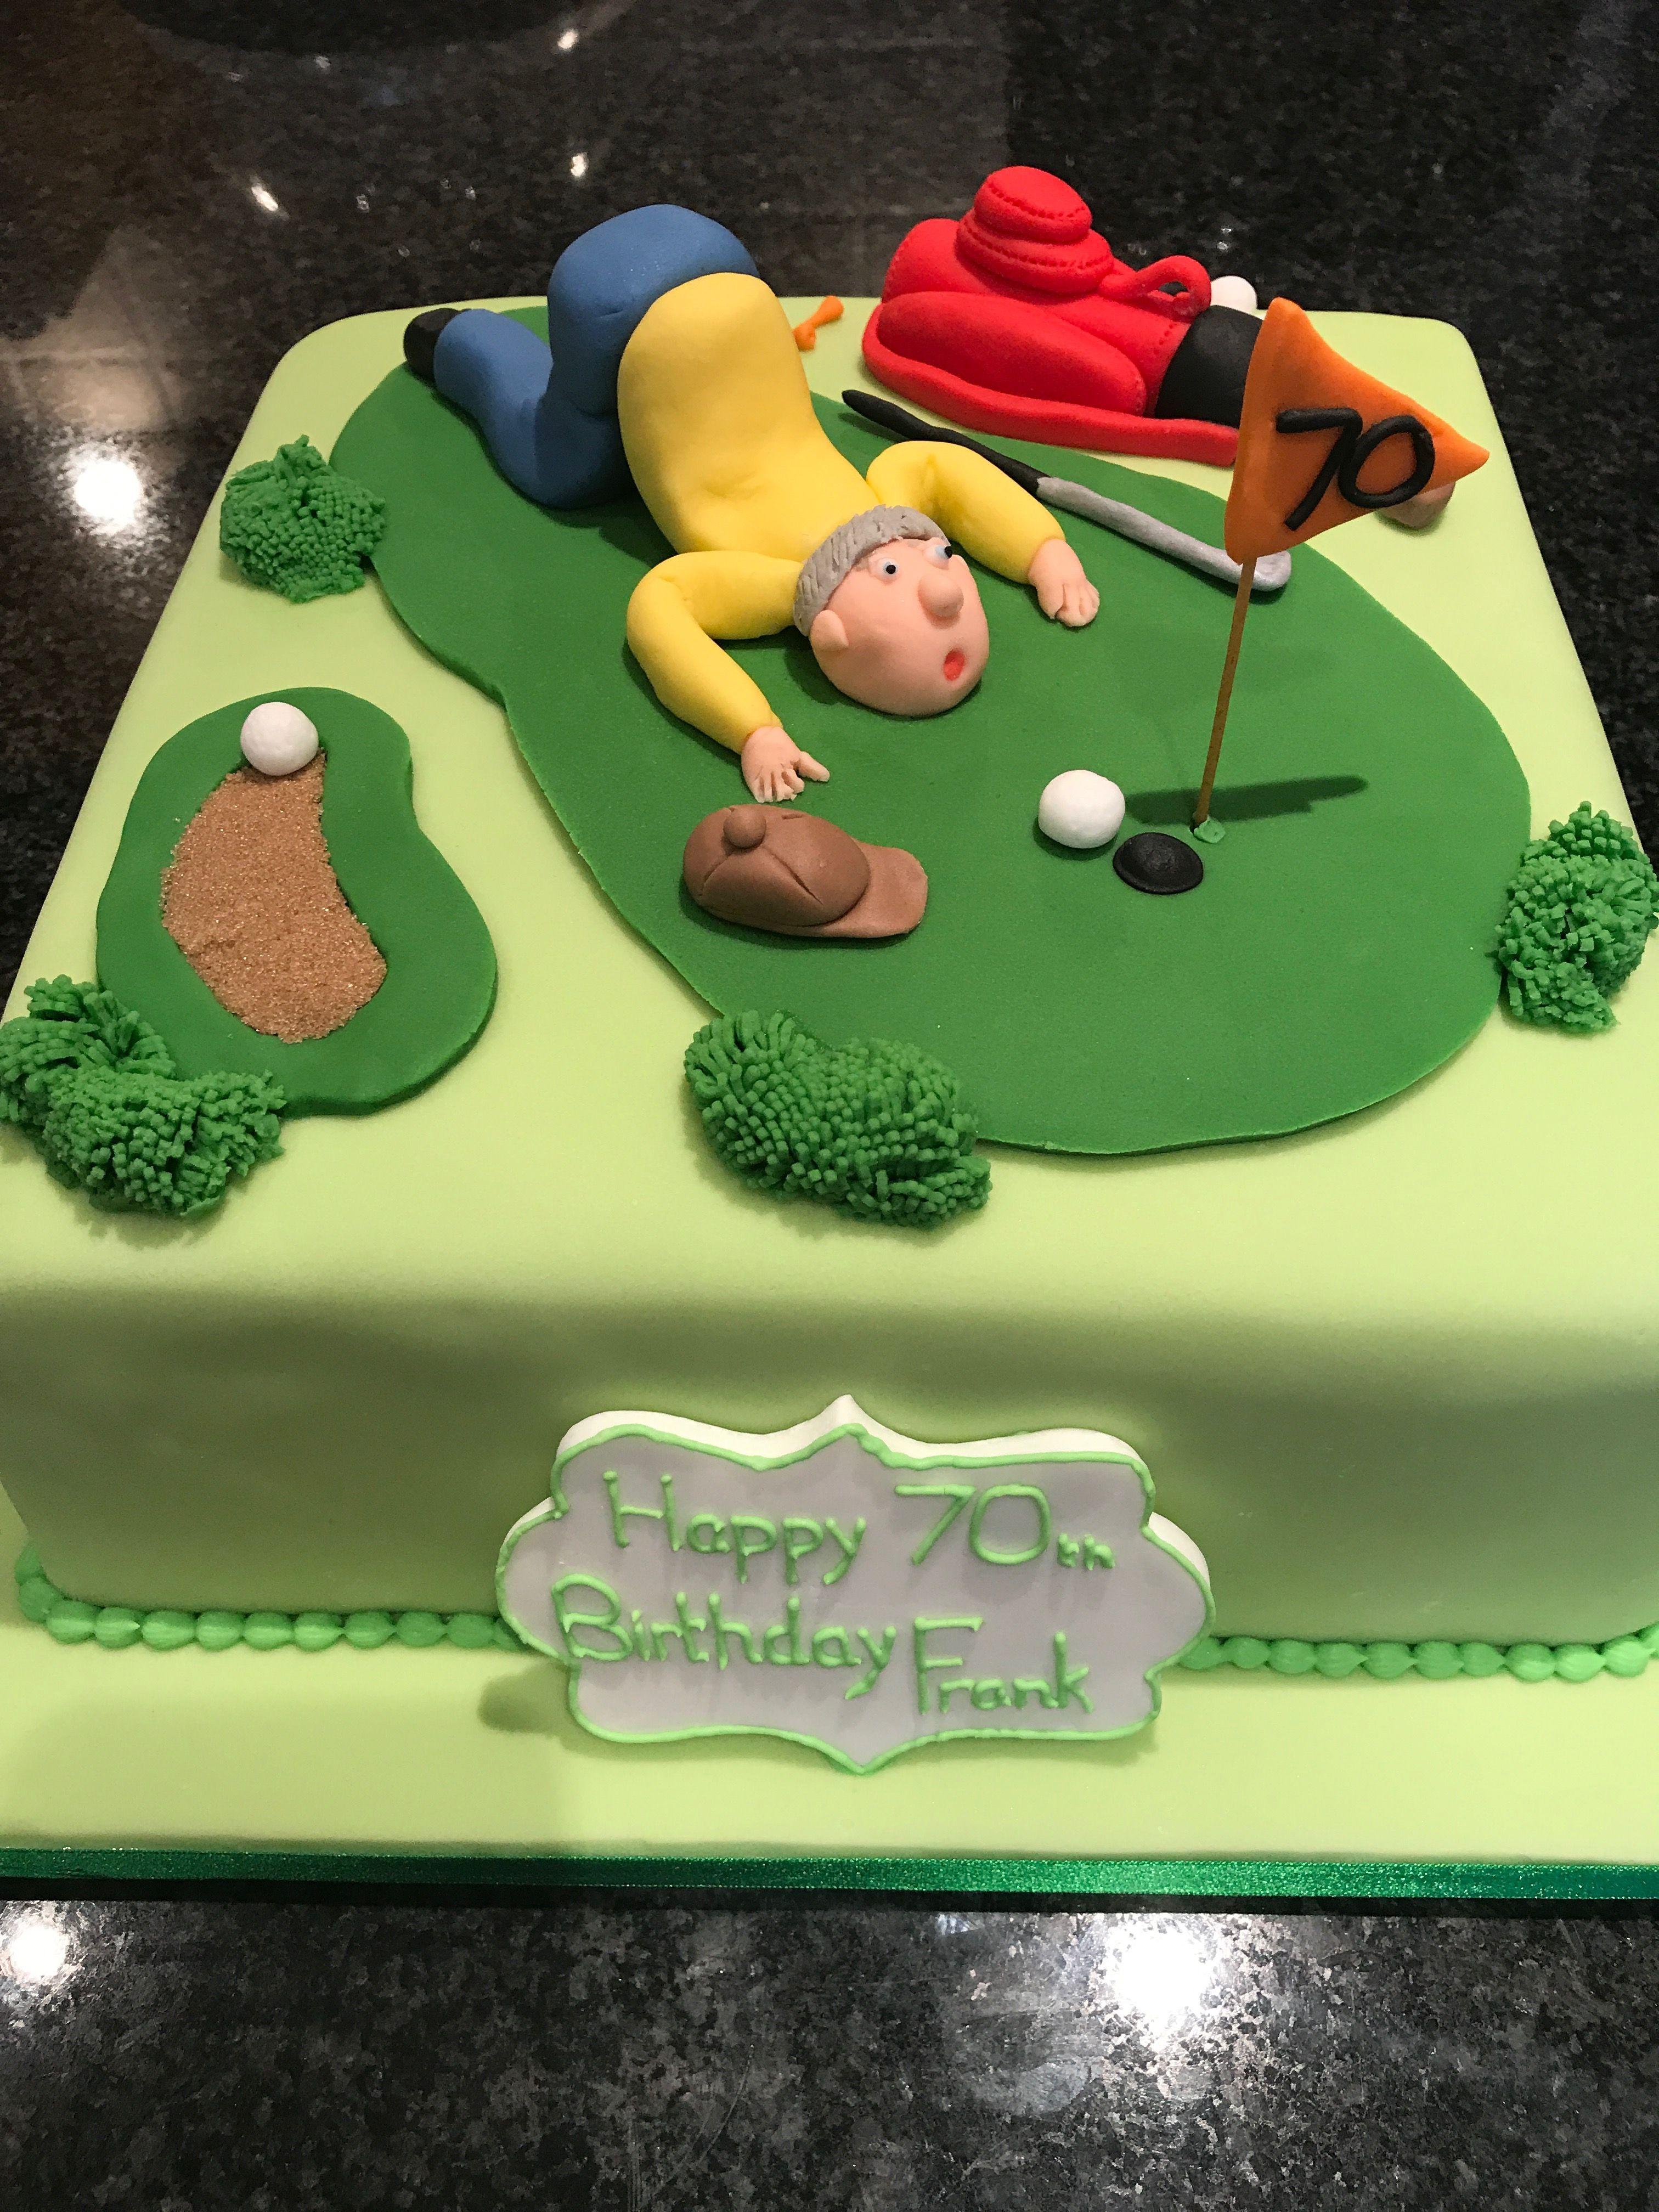 Astounding Golfers Cake Golf Birthday Cakes Golf Cake 70Th Birthday Cake Birthday Cards Printable Opercafe Filternl